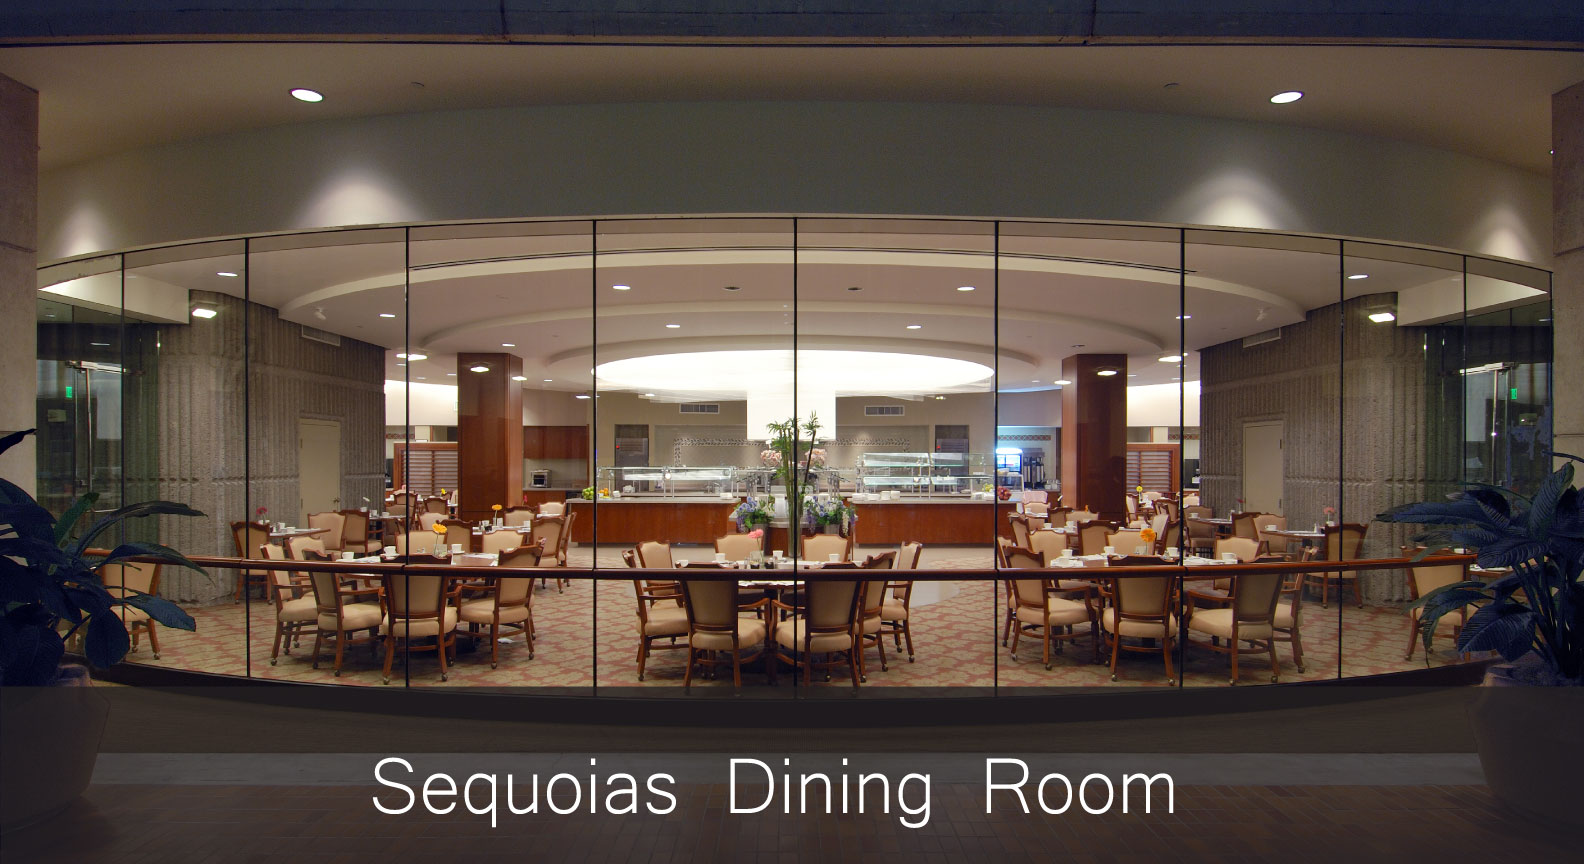 Sequoias-Dining-Room.jpg